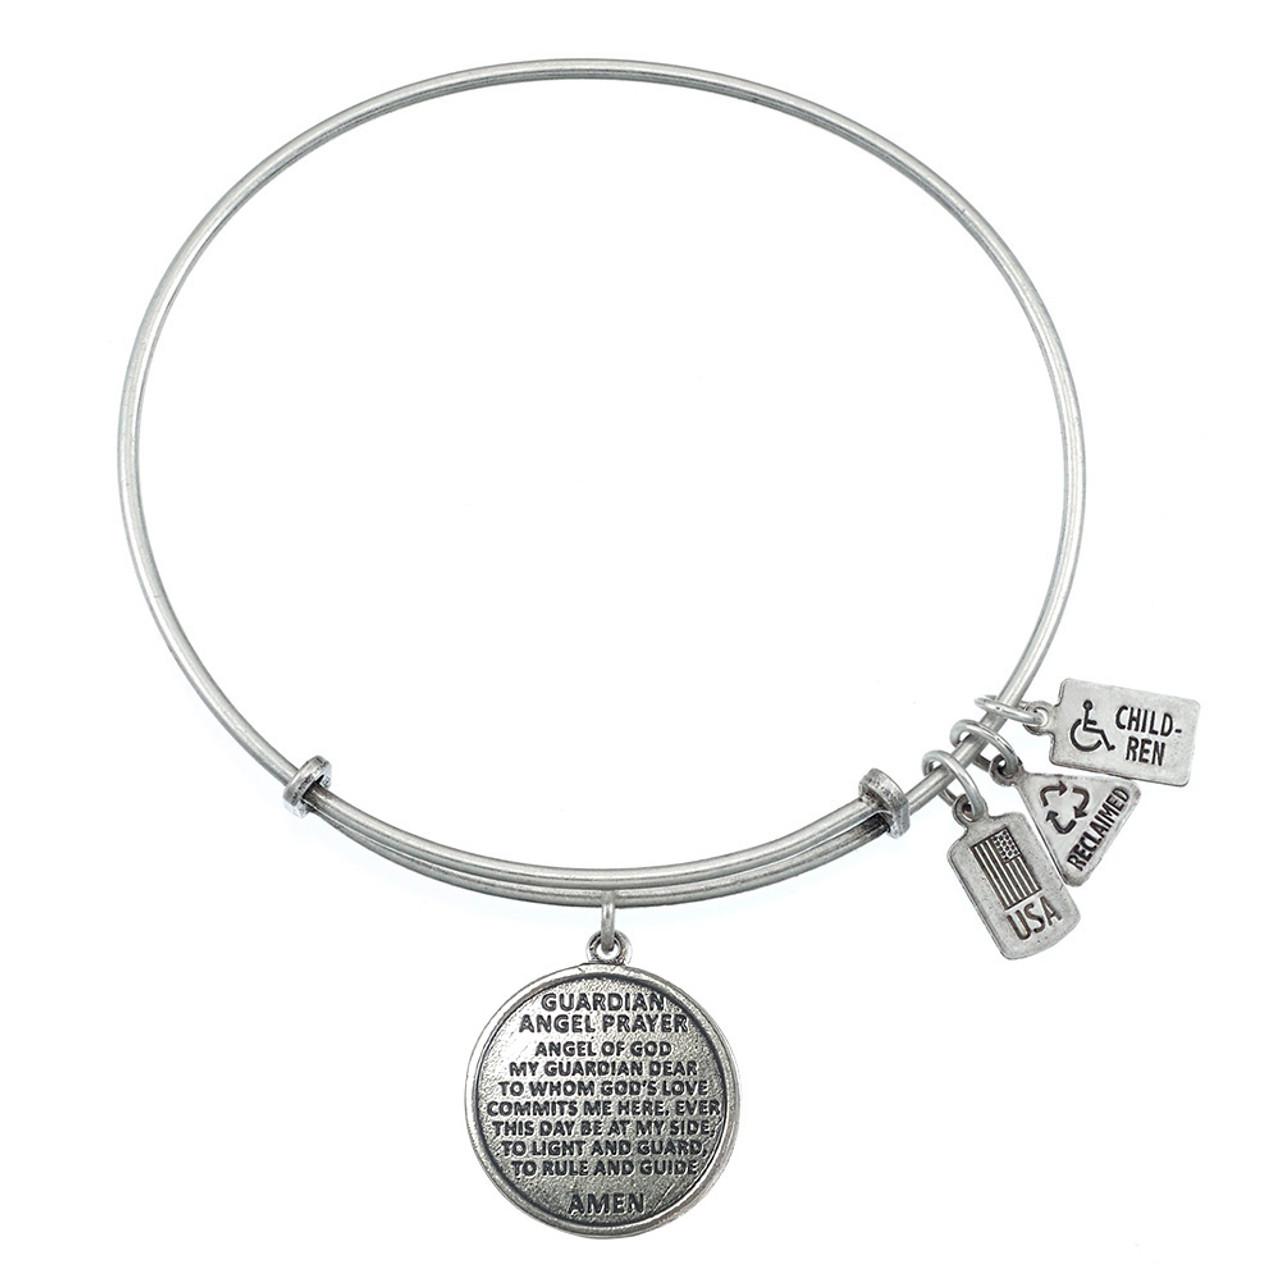 Black Glass Bead Bracelet ANGEL WING Charm Spiritual Protection Guidance